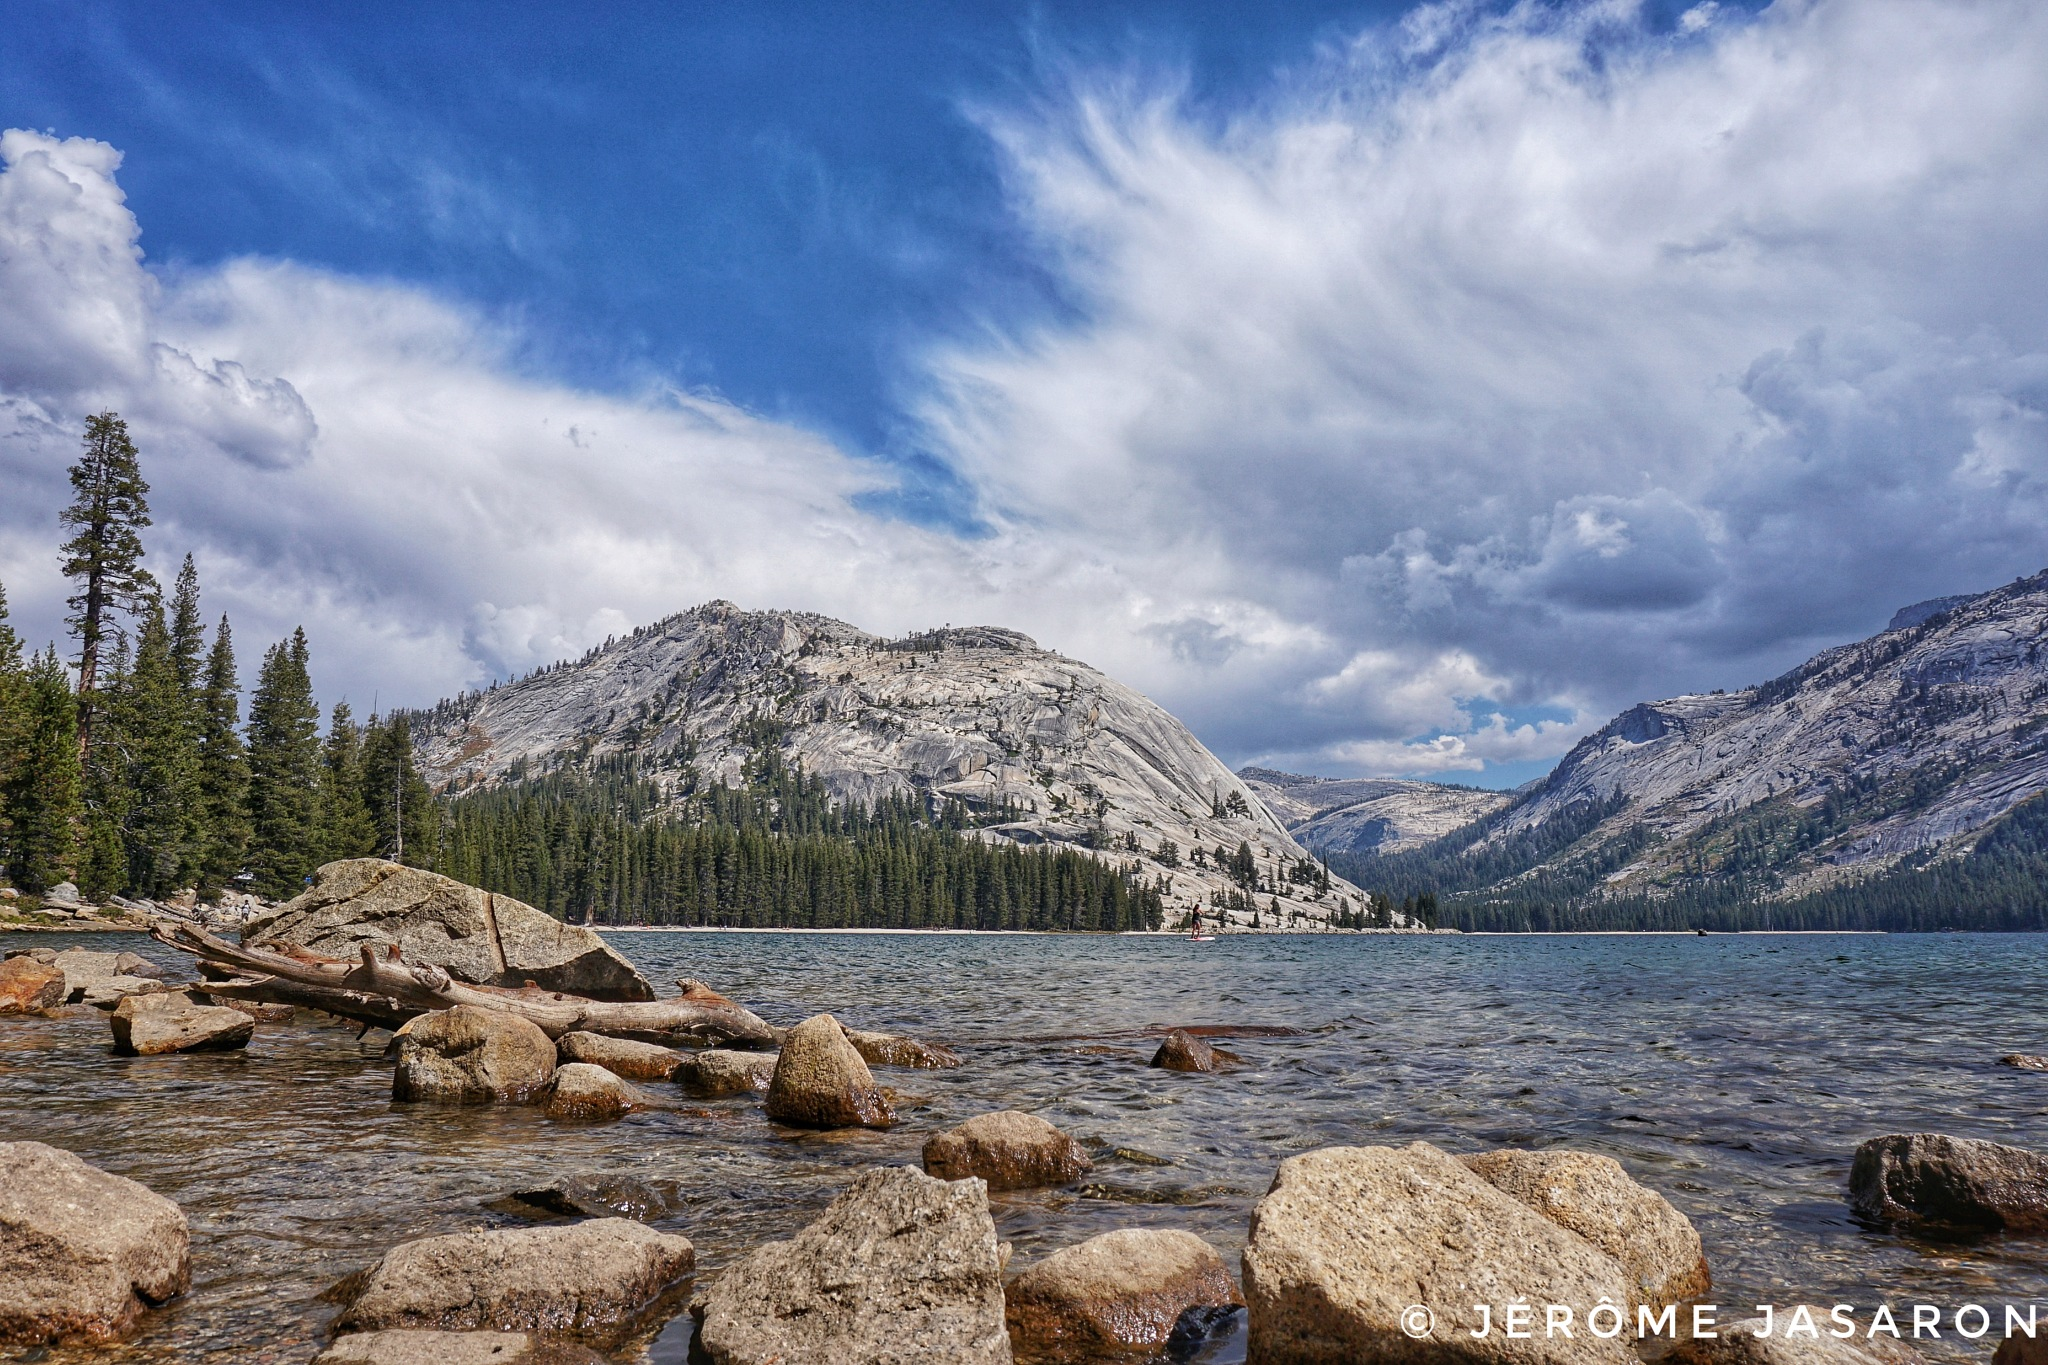 Yosemite's road by jeromejasaron